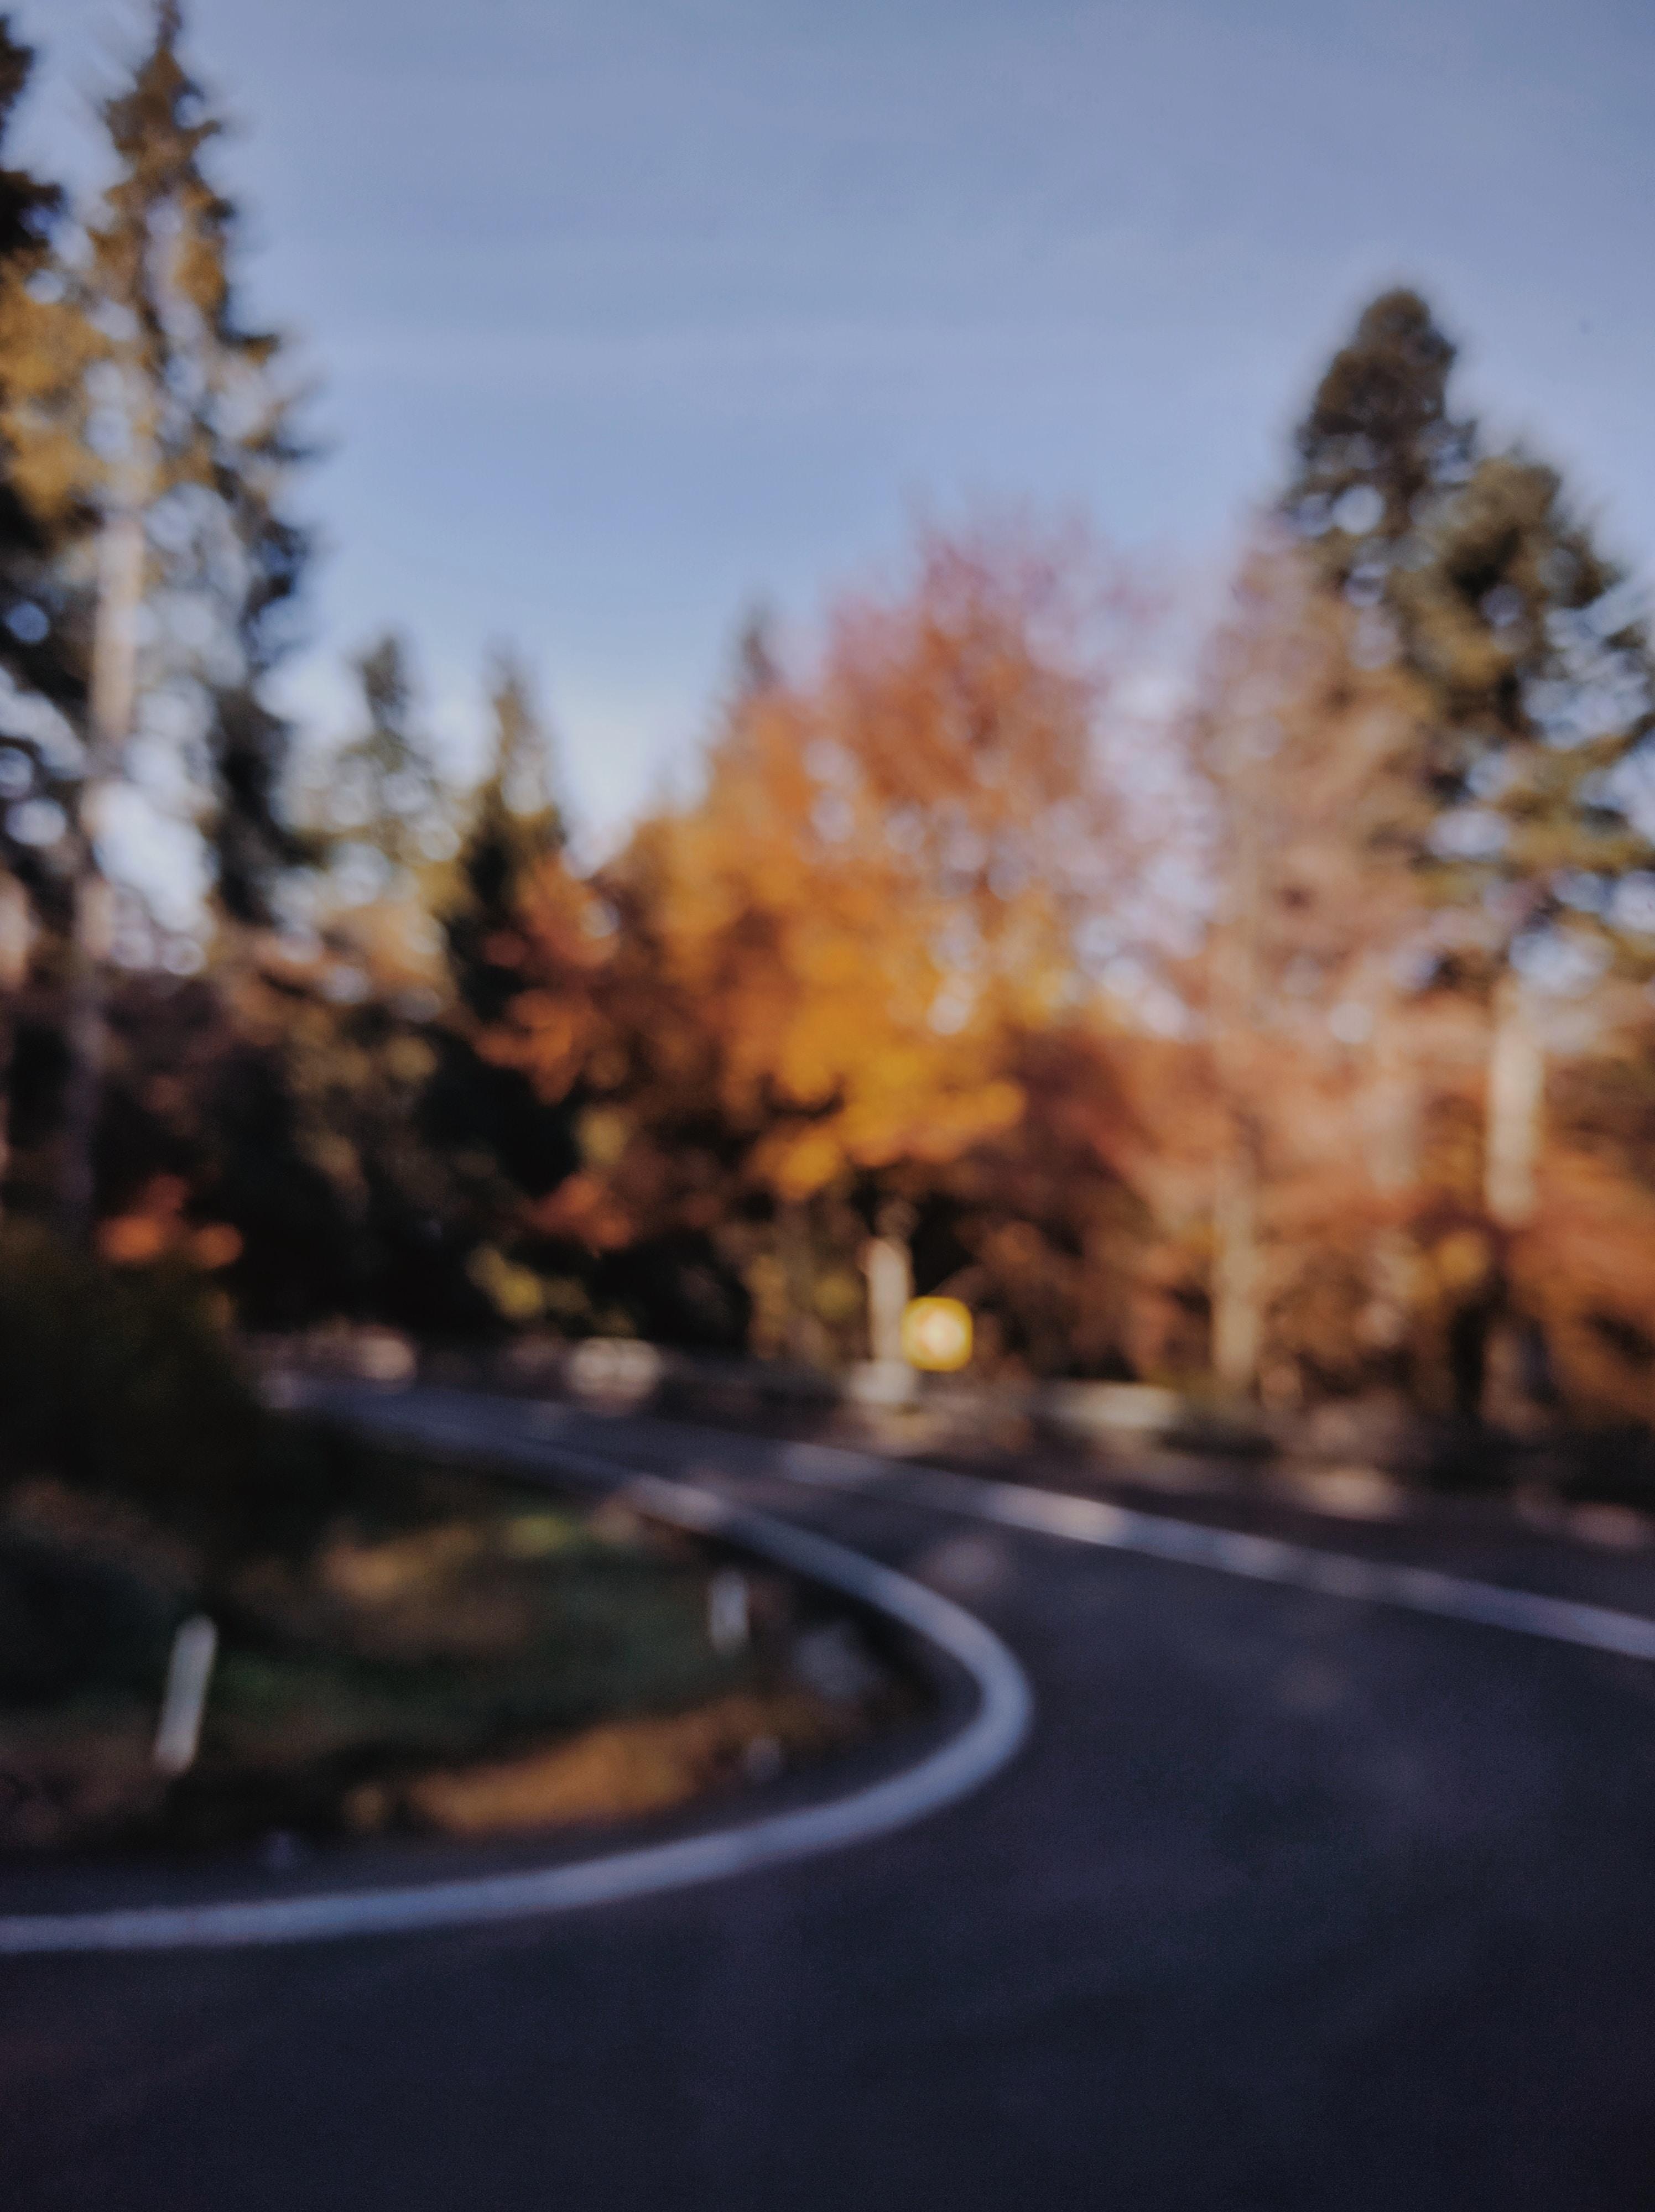 winding road between trees